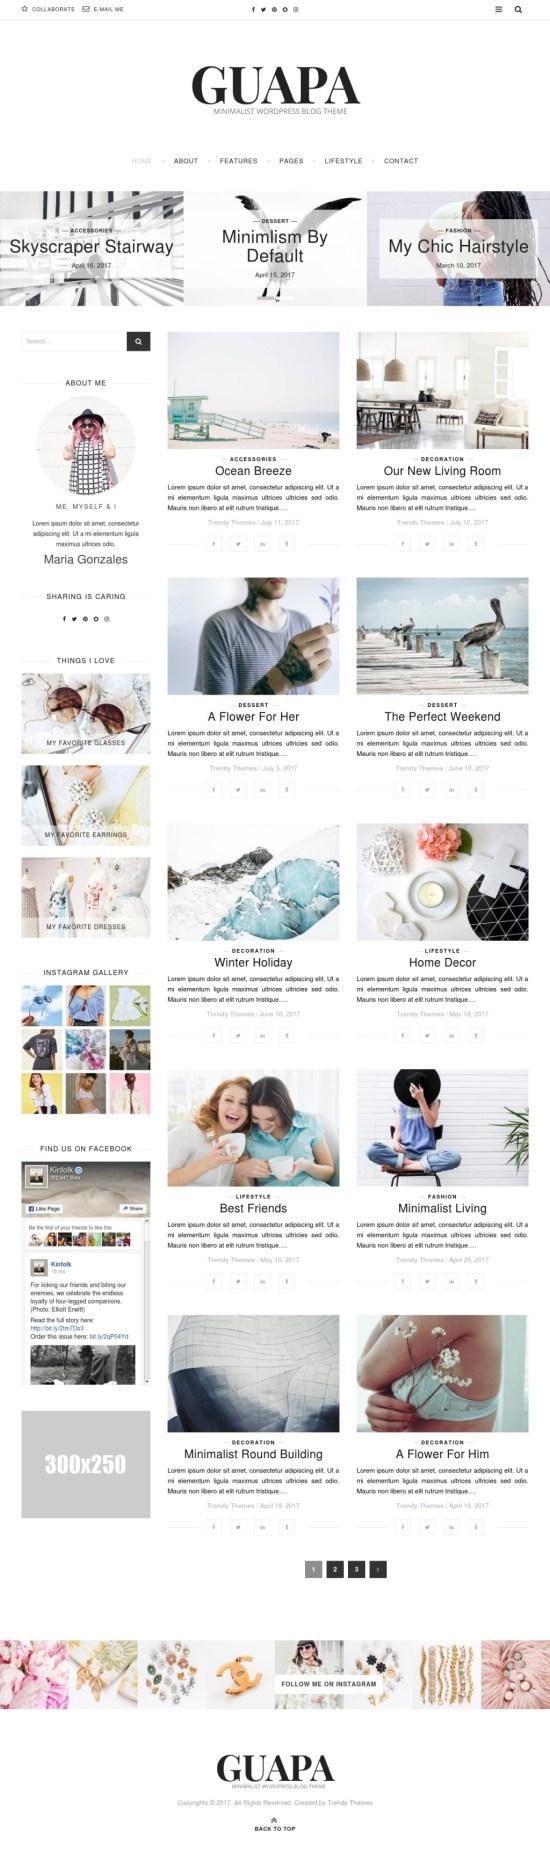 guapa wordpress templatemonster theme 01 - Guapa WordPress Theme